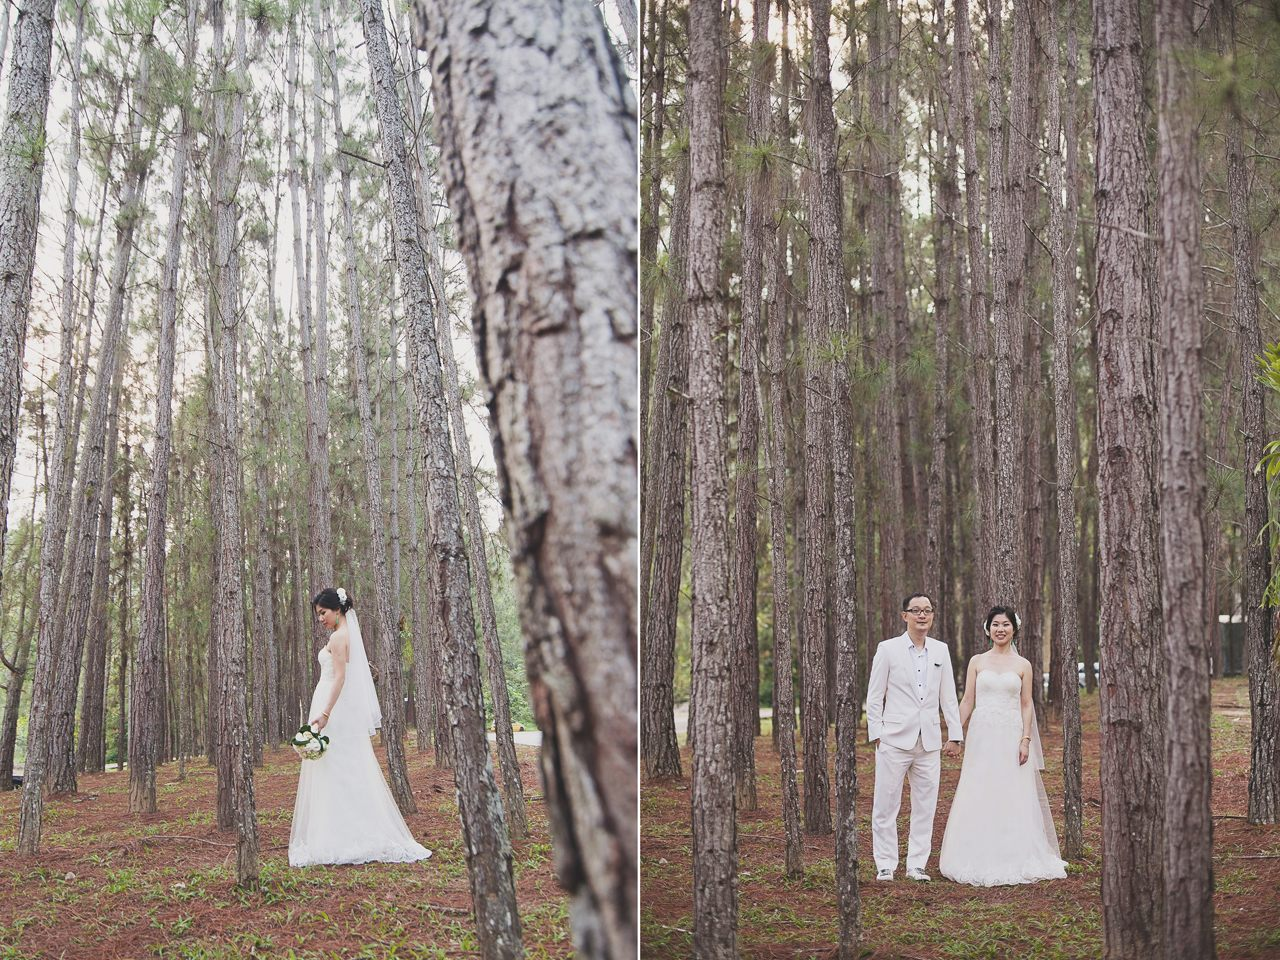 Pre-wedding photoshoot in Tanarimba, Pahang. Photo by Gallerie CK